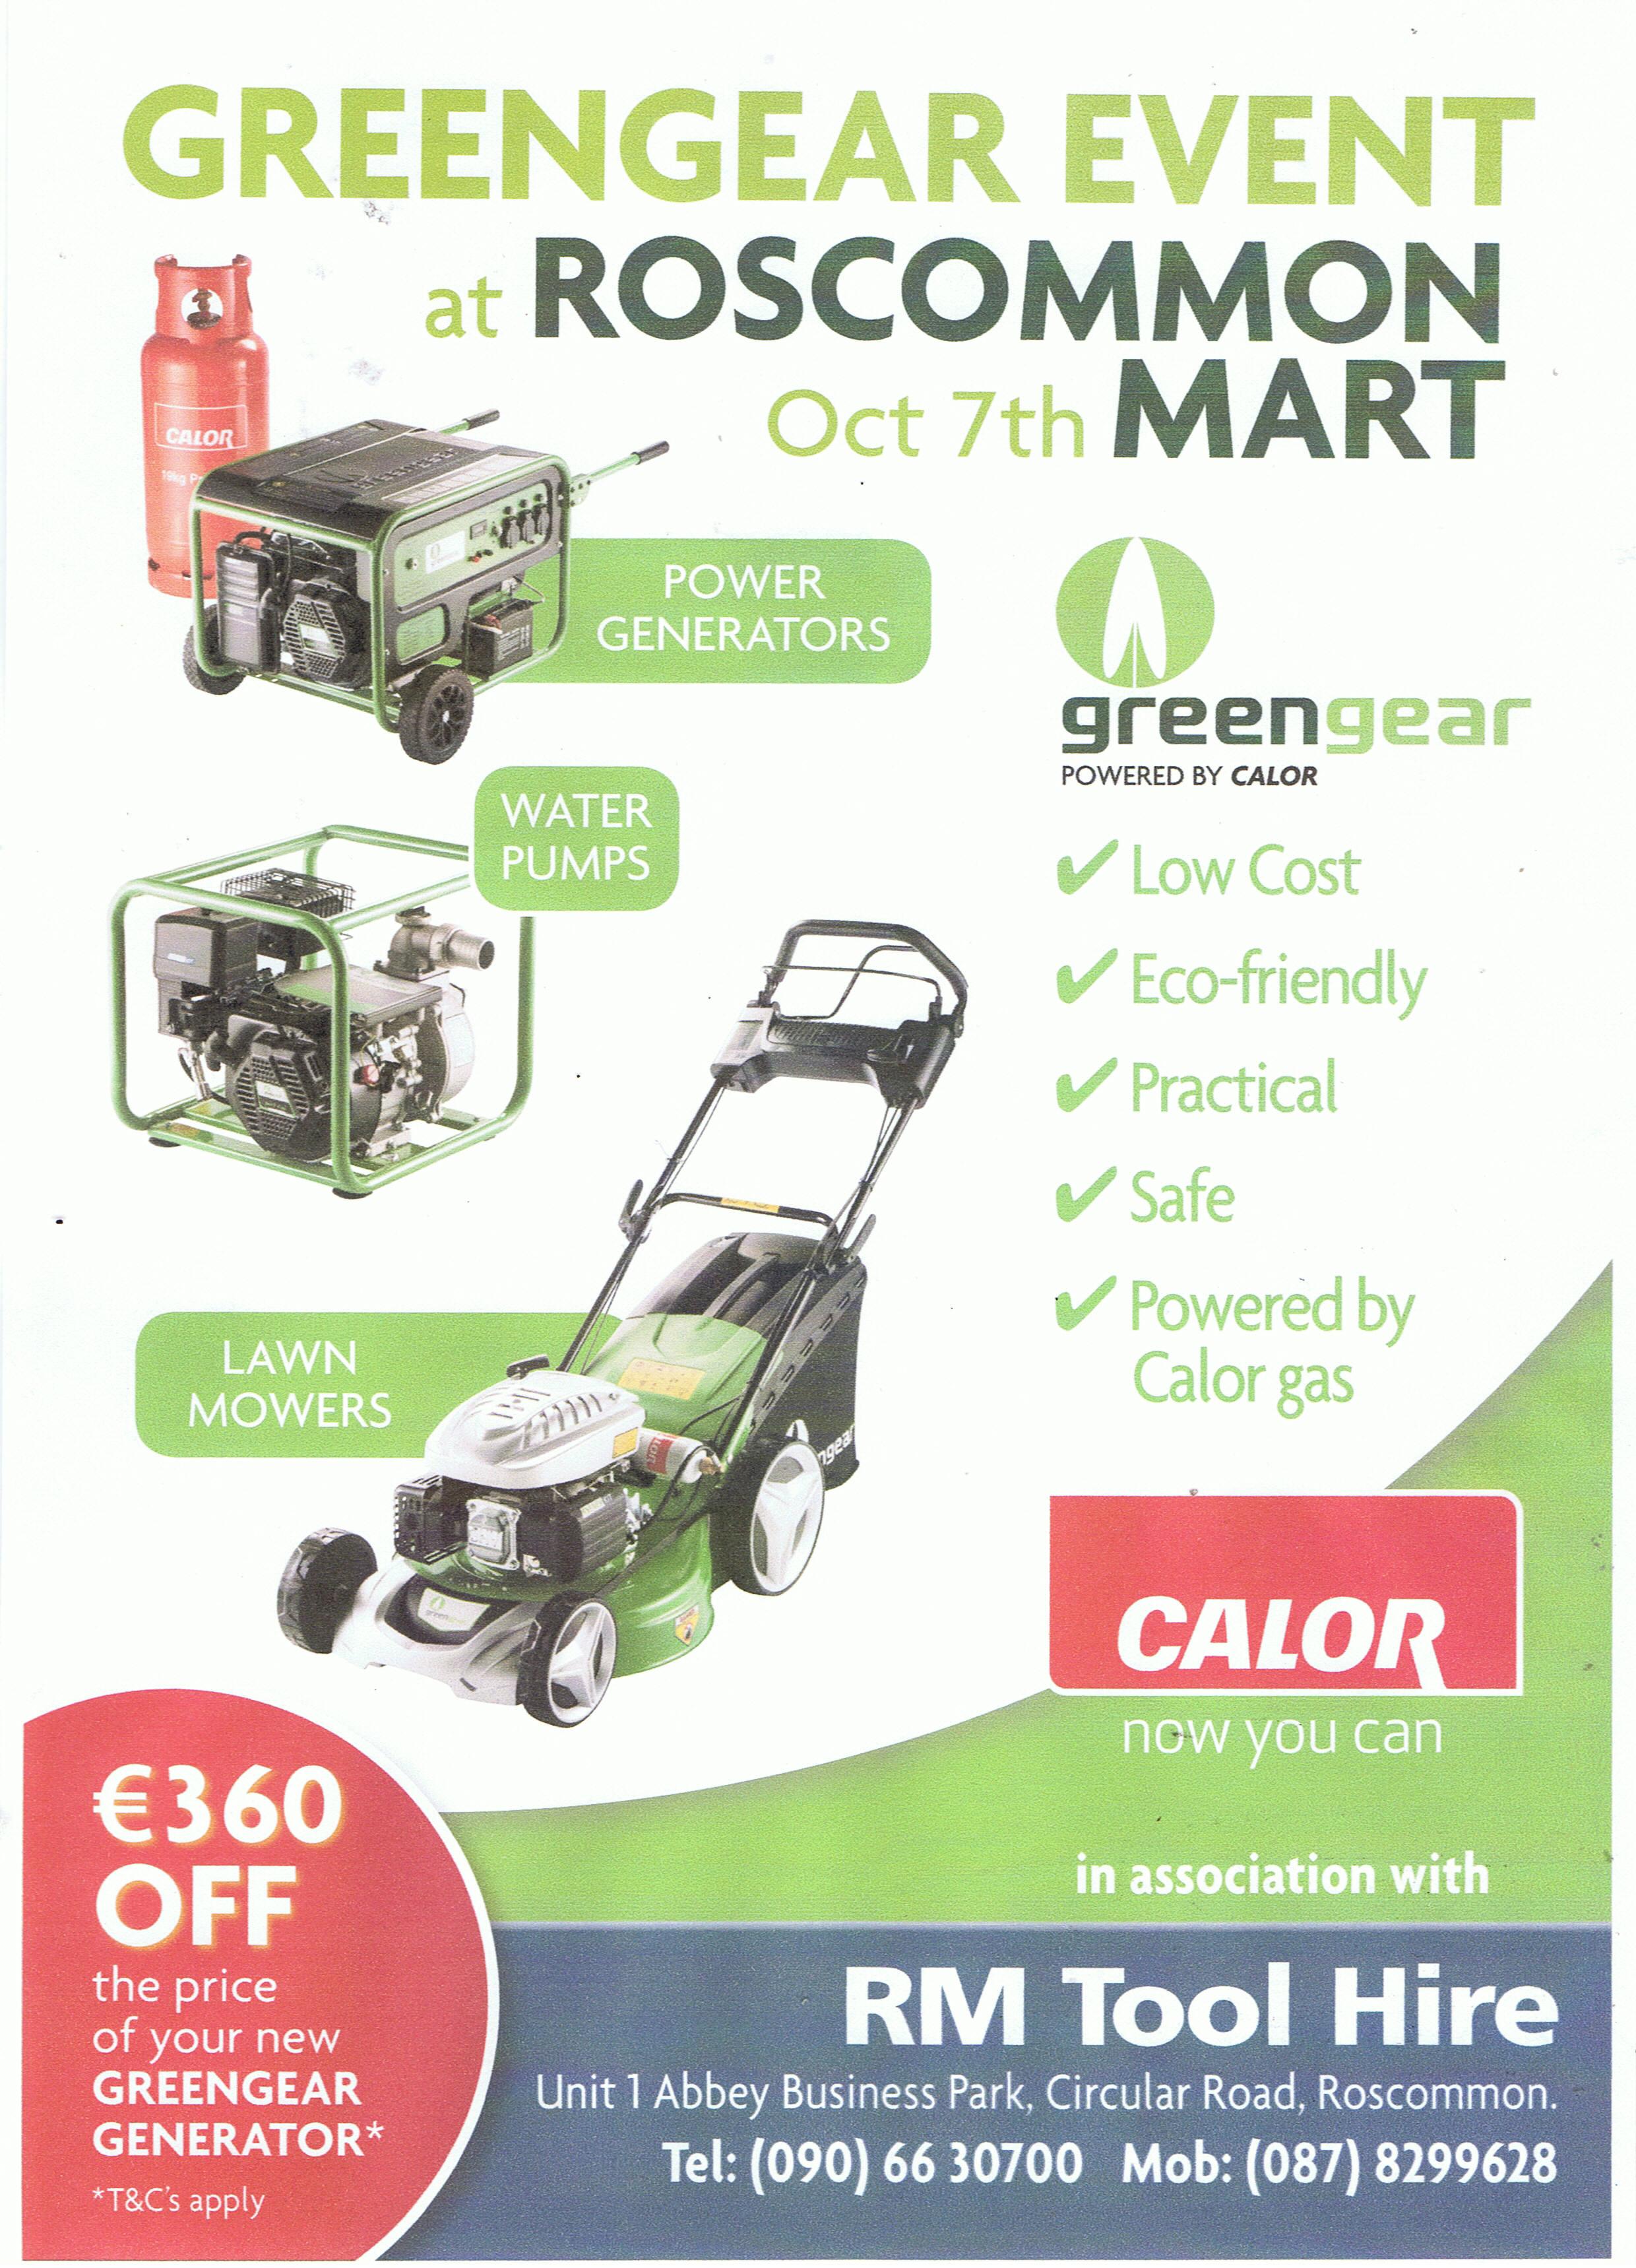 greengear-event